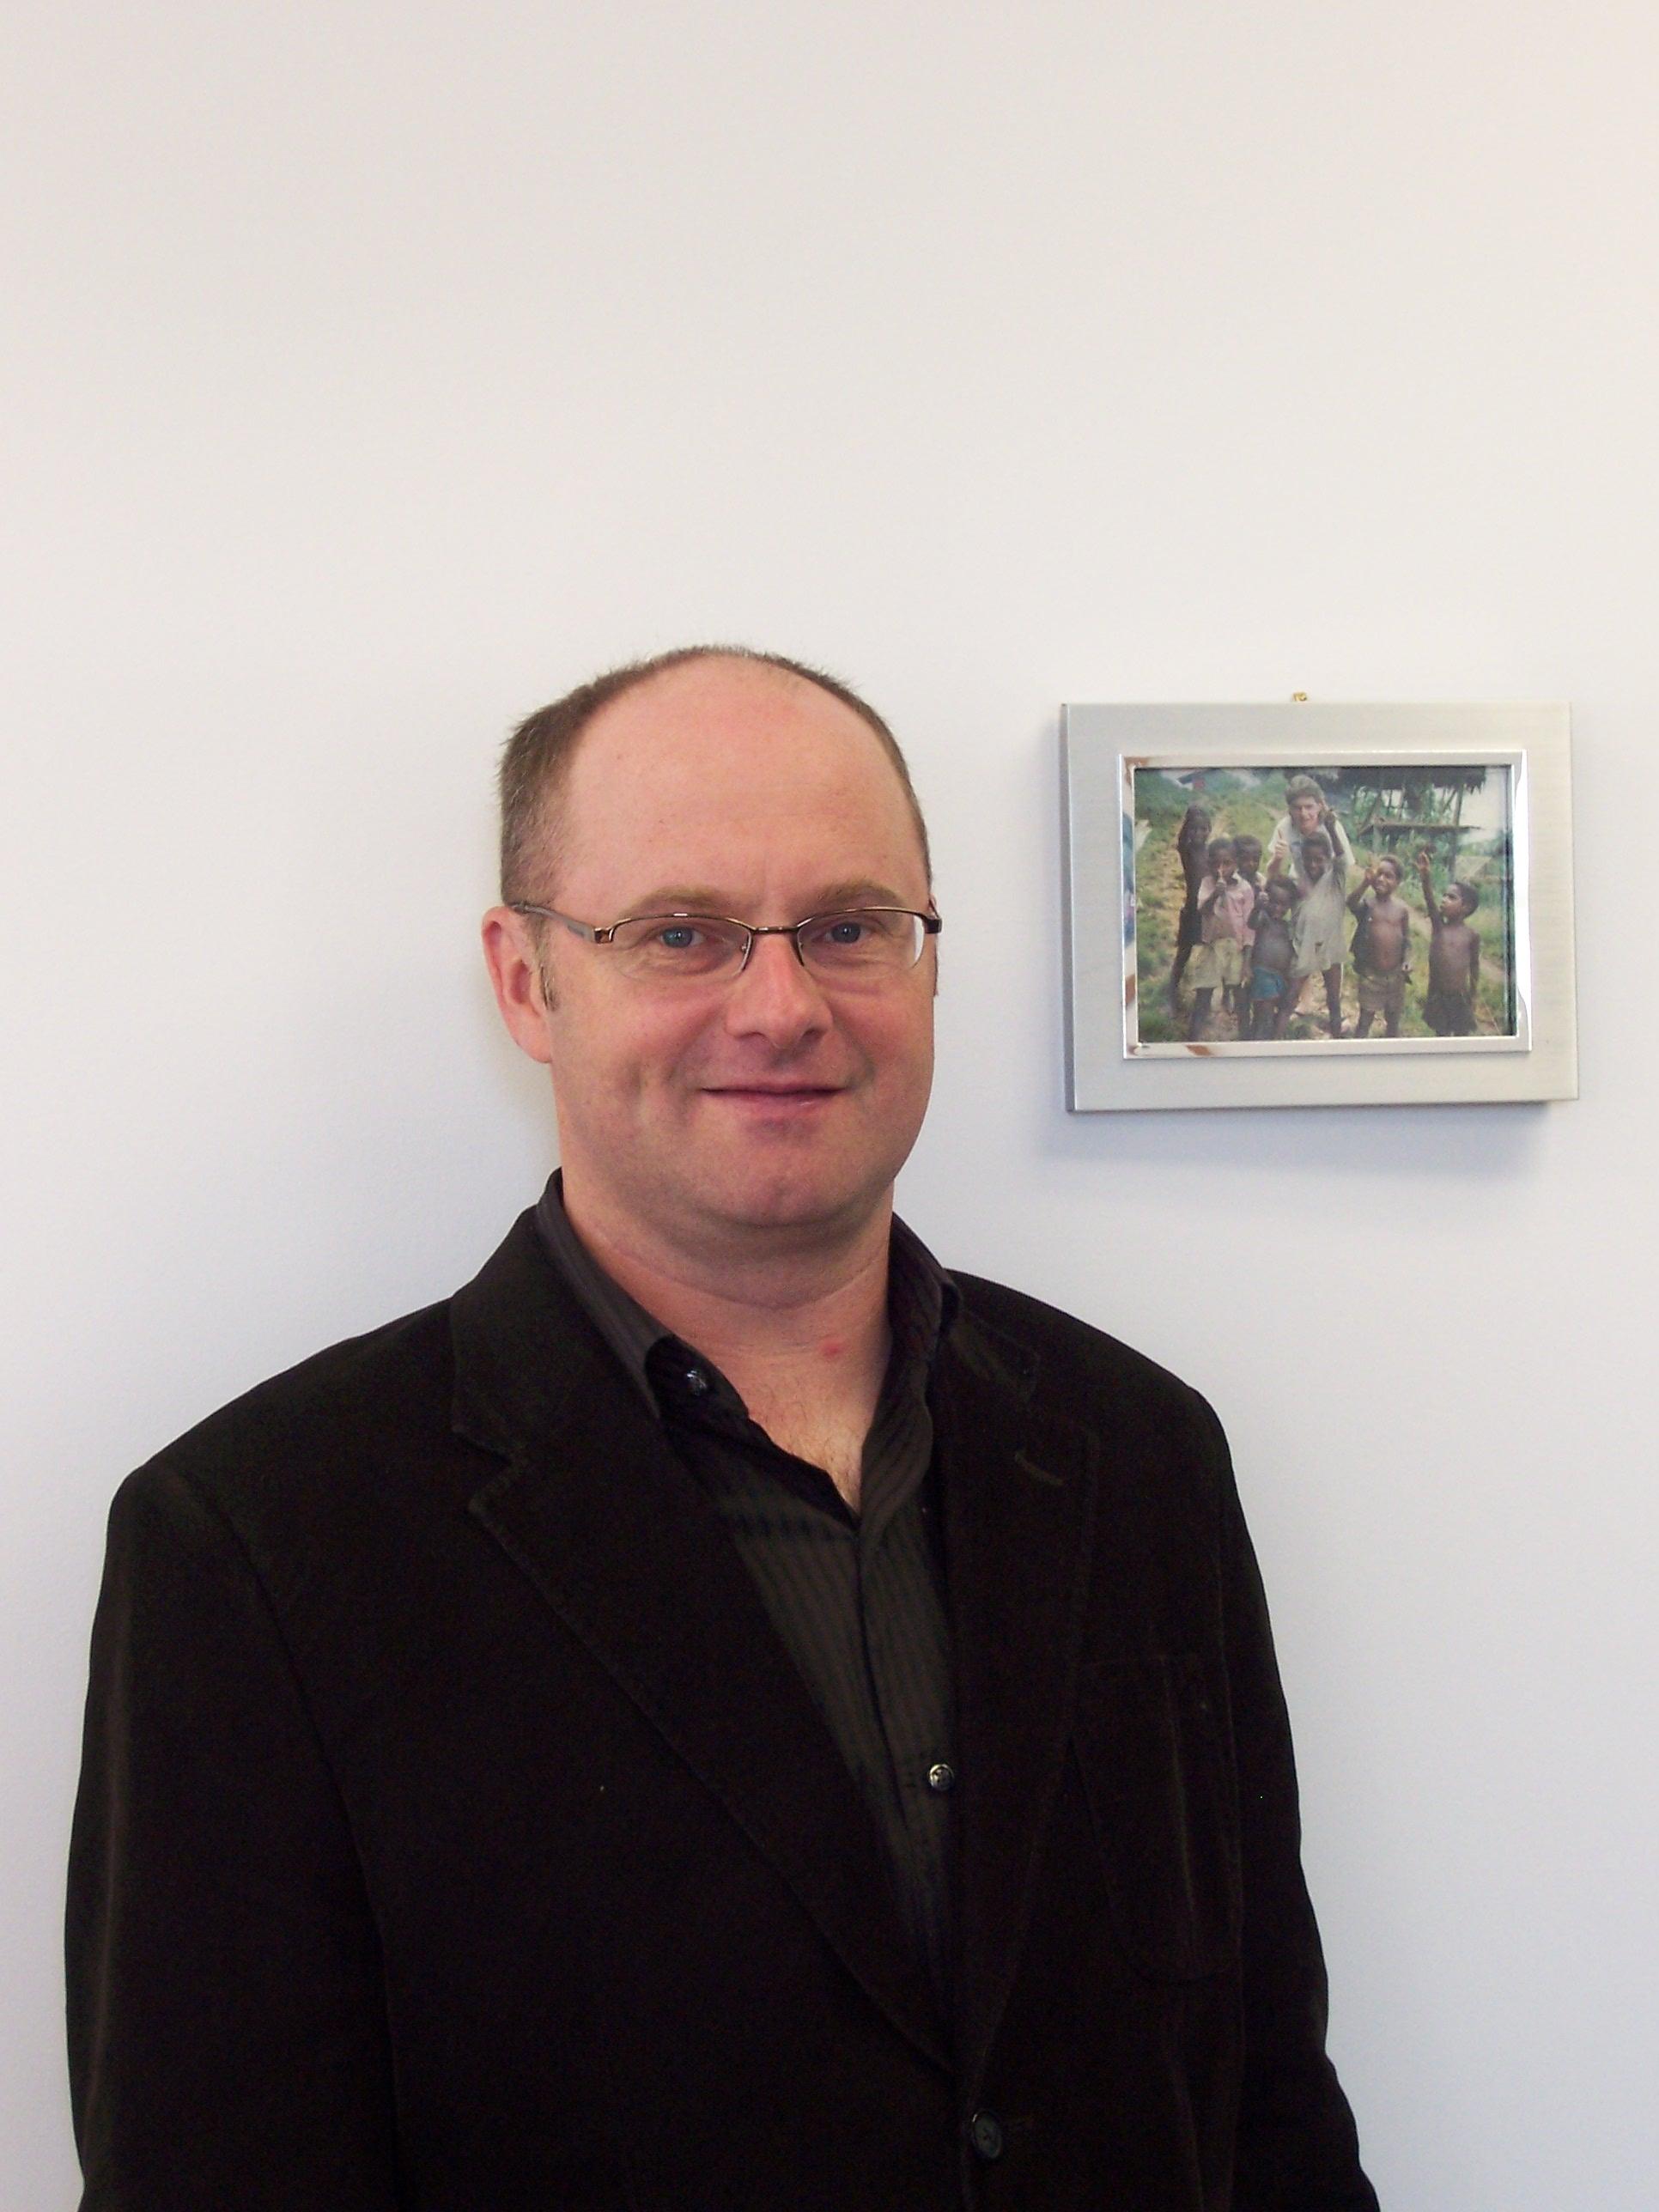 Colin Salisbury of Global Volunteer Network